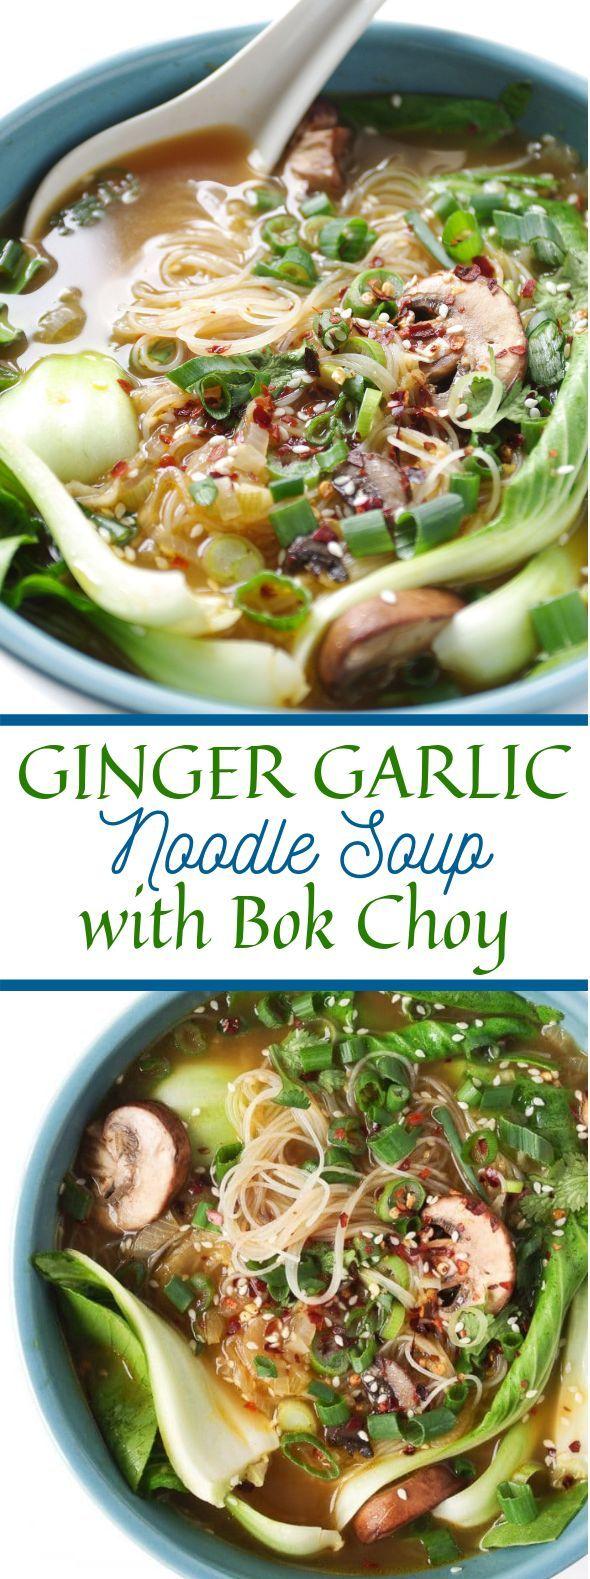 GINGER GARLIC NOODLE SOUP WITH BOK CHOY (BOK CHOY SOUP) #veggies #vegetarian   Vegetarian soup, Vege